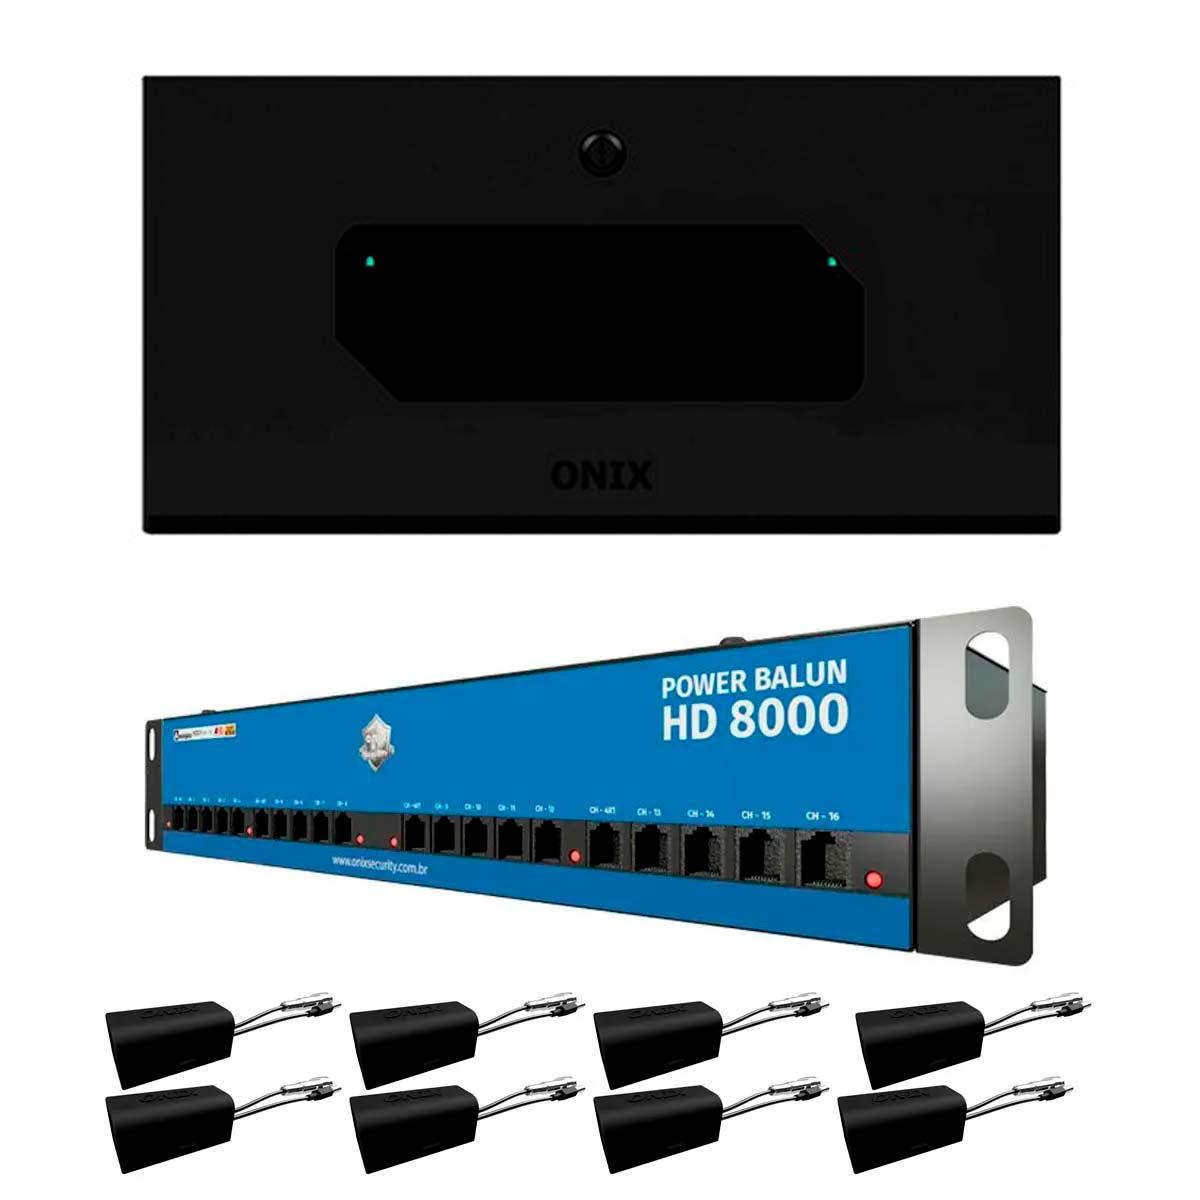 kit-rack-5u-power-balun-8ch-hd-8000-onix-security-ate-5mp-leva-sinal-de-video-e-alimentacaod